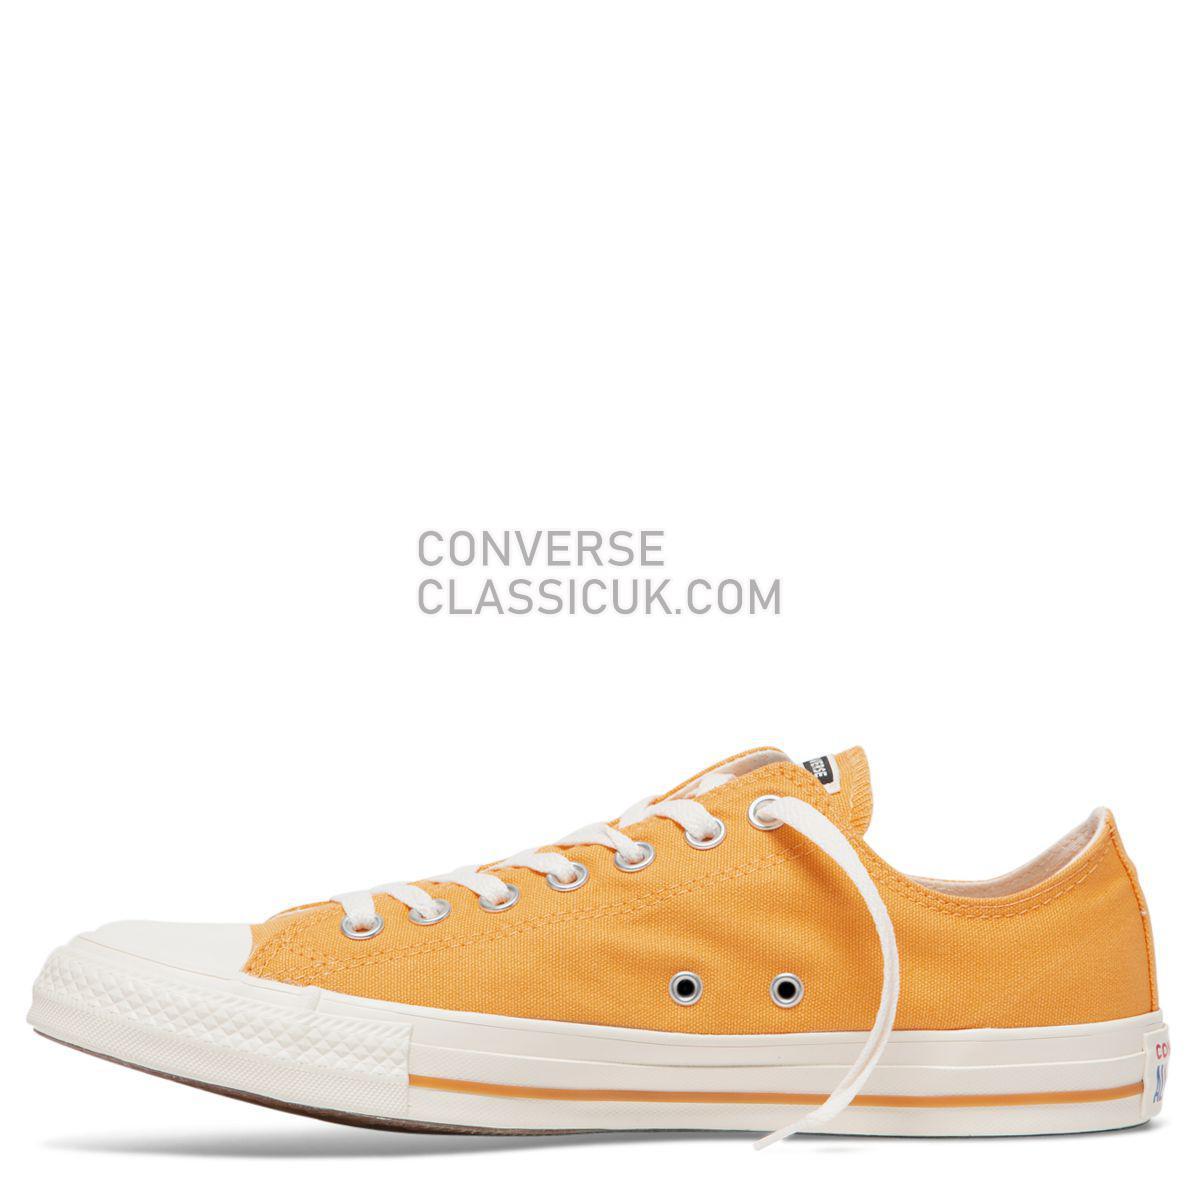 Converse Chuck Taylor All Star Cali Wash Low Top Melon Baller Mens Womens Unisex 165692 Melon Baller/Egret/Egret Shoes